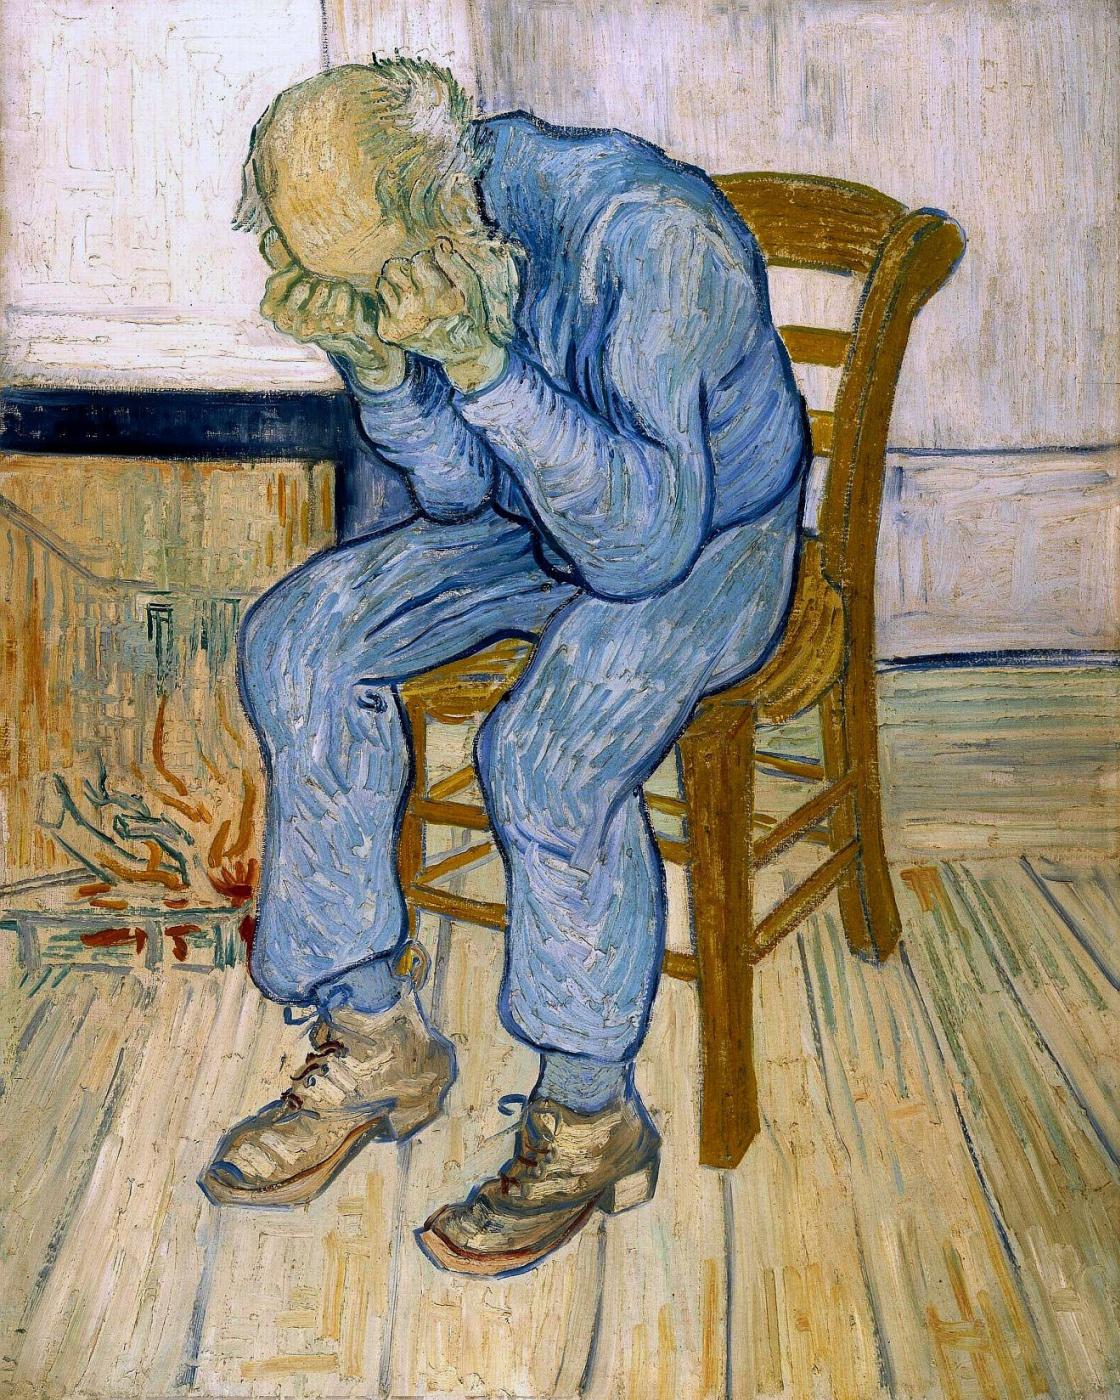 Vincent van Gogh. On the threshold of eternity